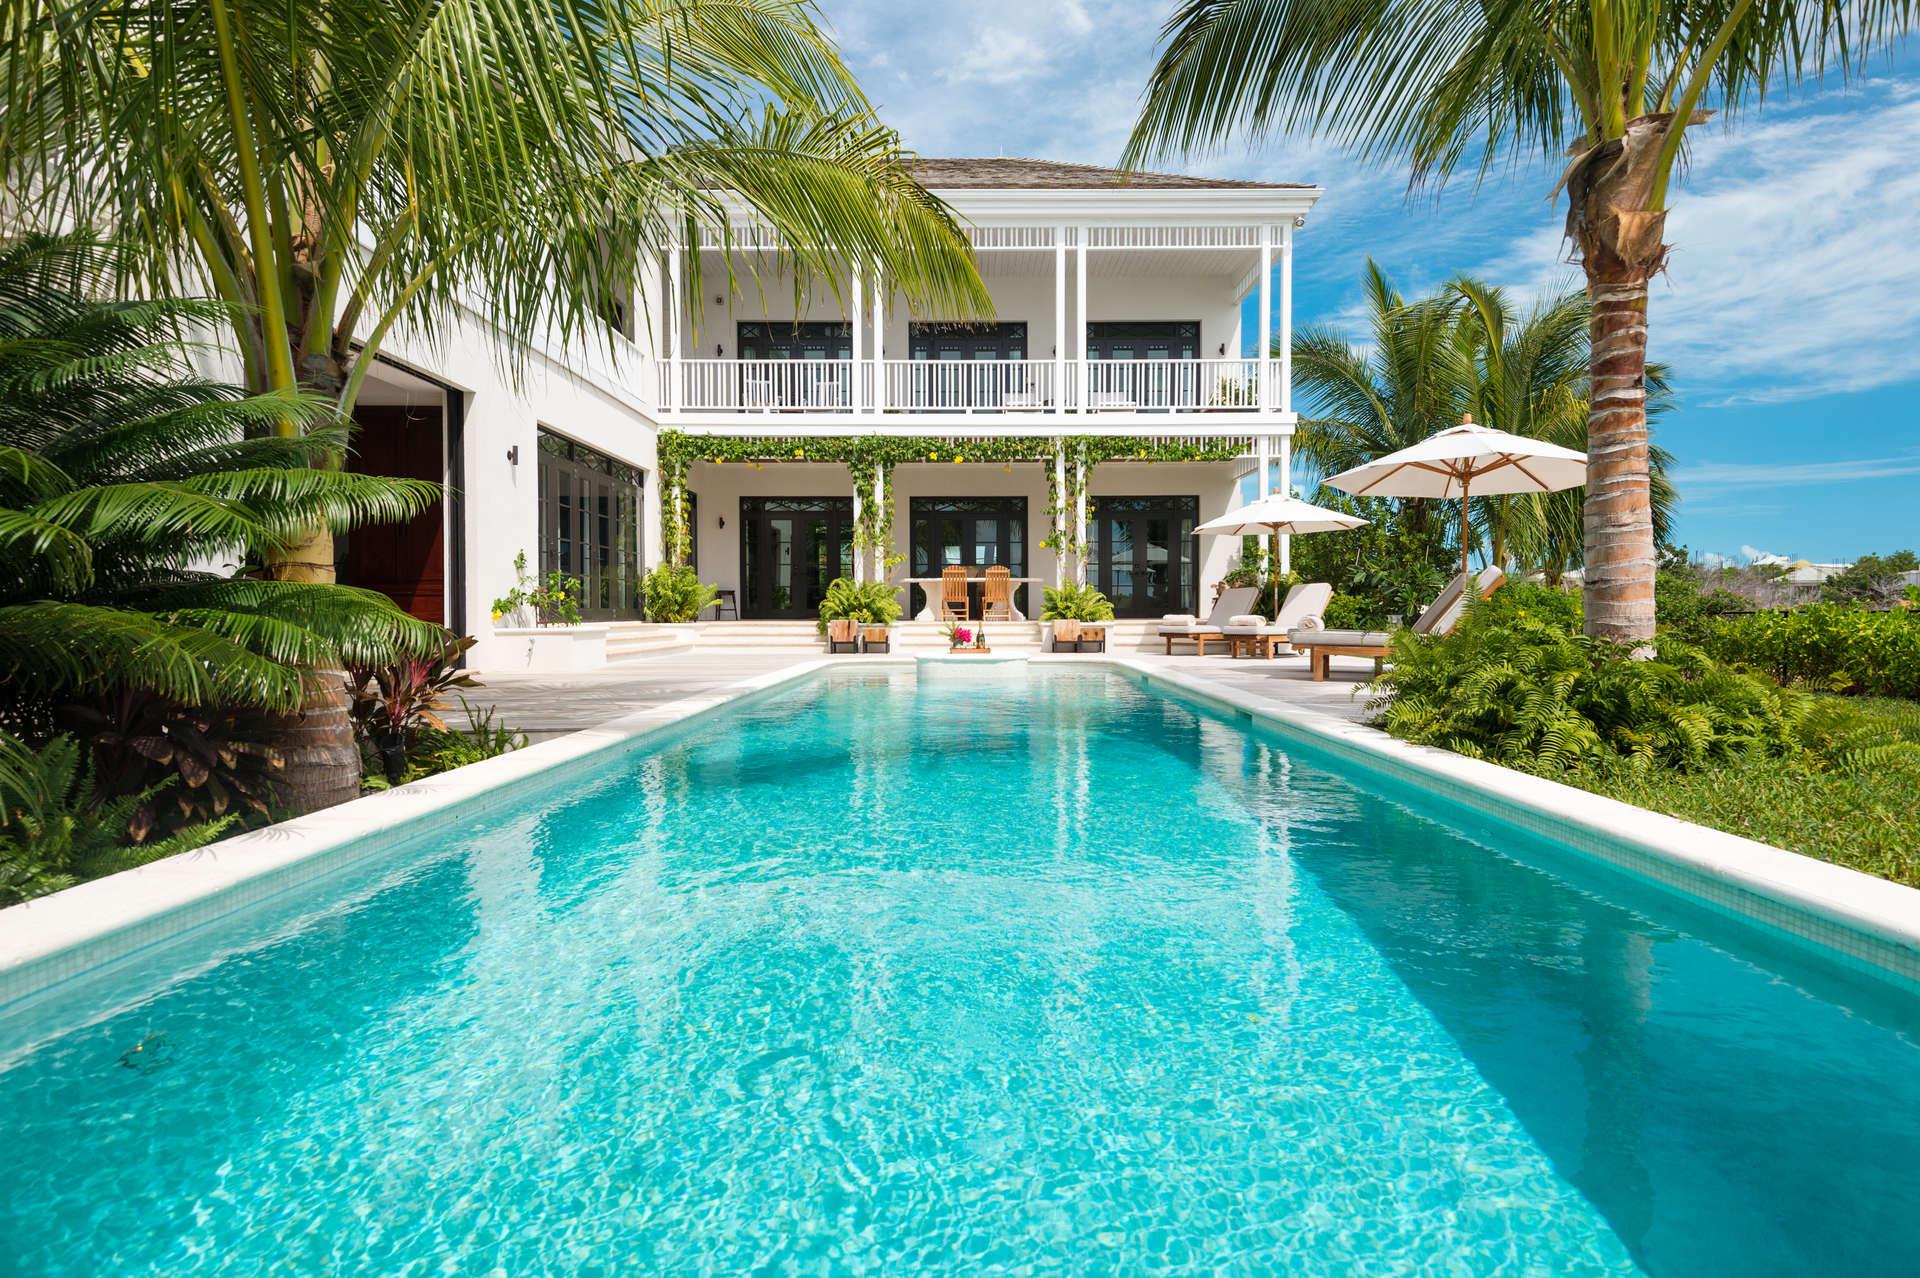 Luxury villa rentals caribbean - Turks and caicos - Providenciales - Grace bay - Saving Grace - Image 1/16